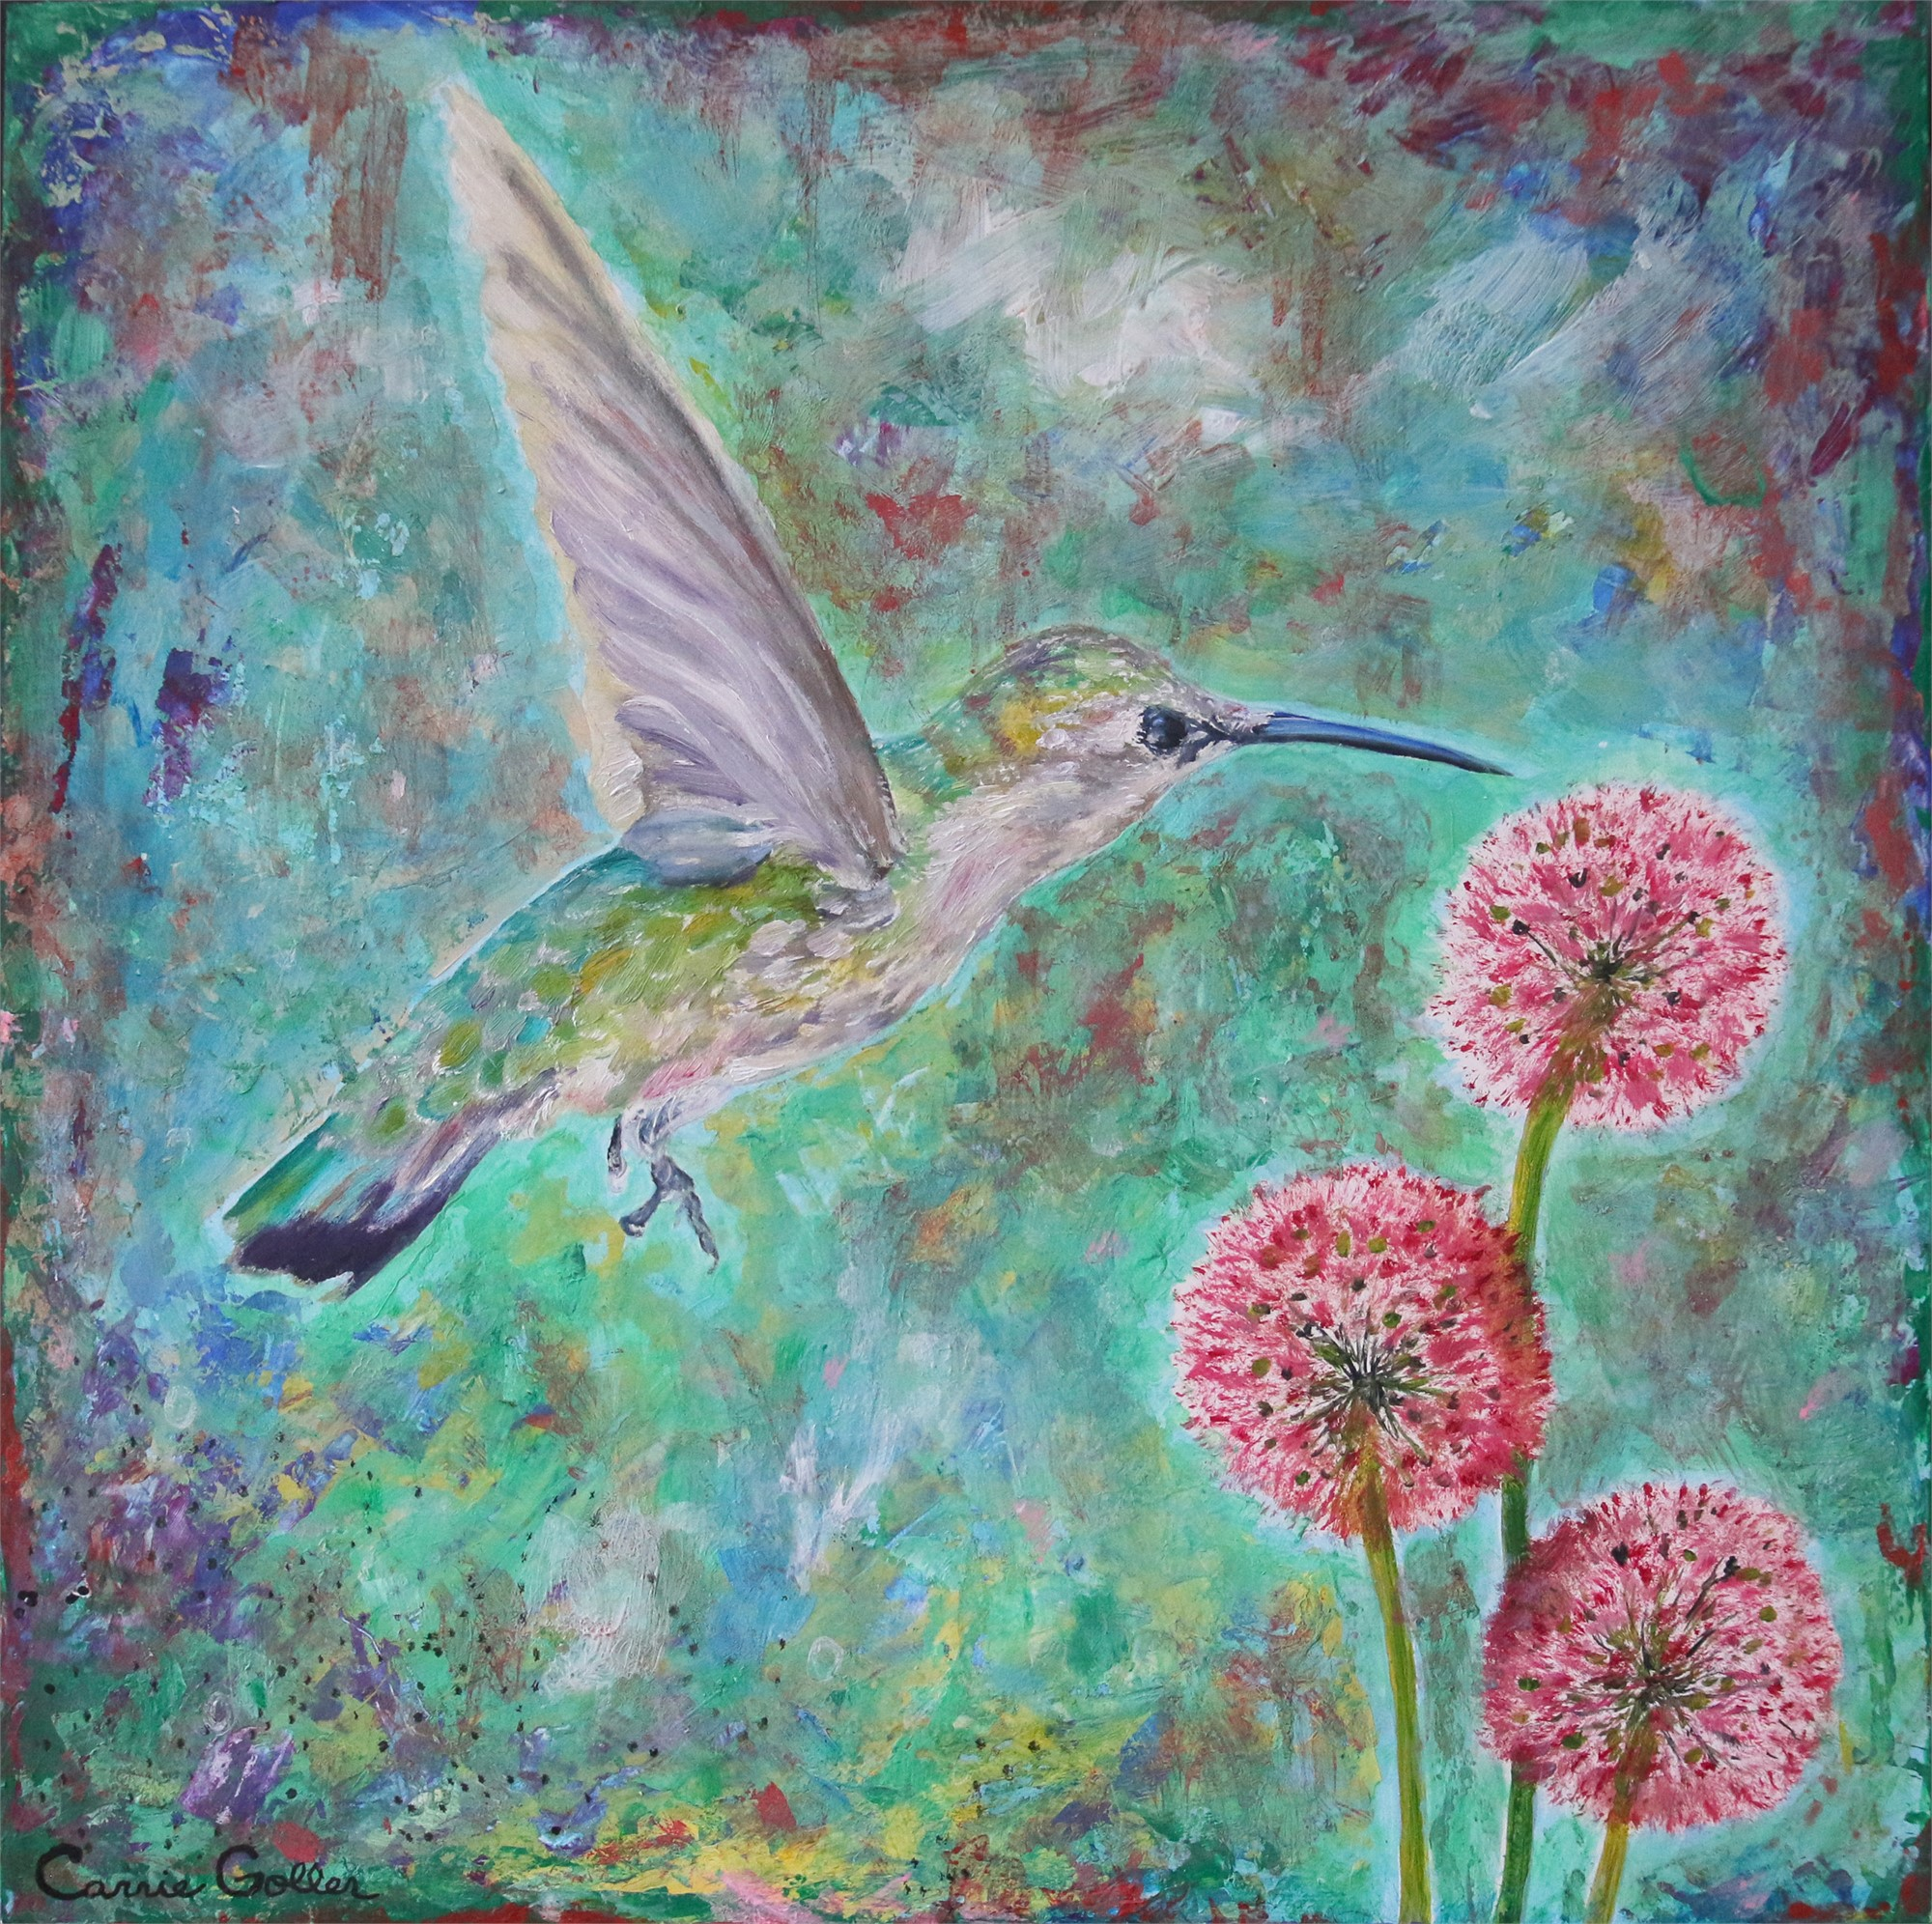 Inspector III-Hummingbird by Carrie Goller